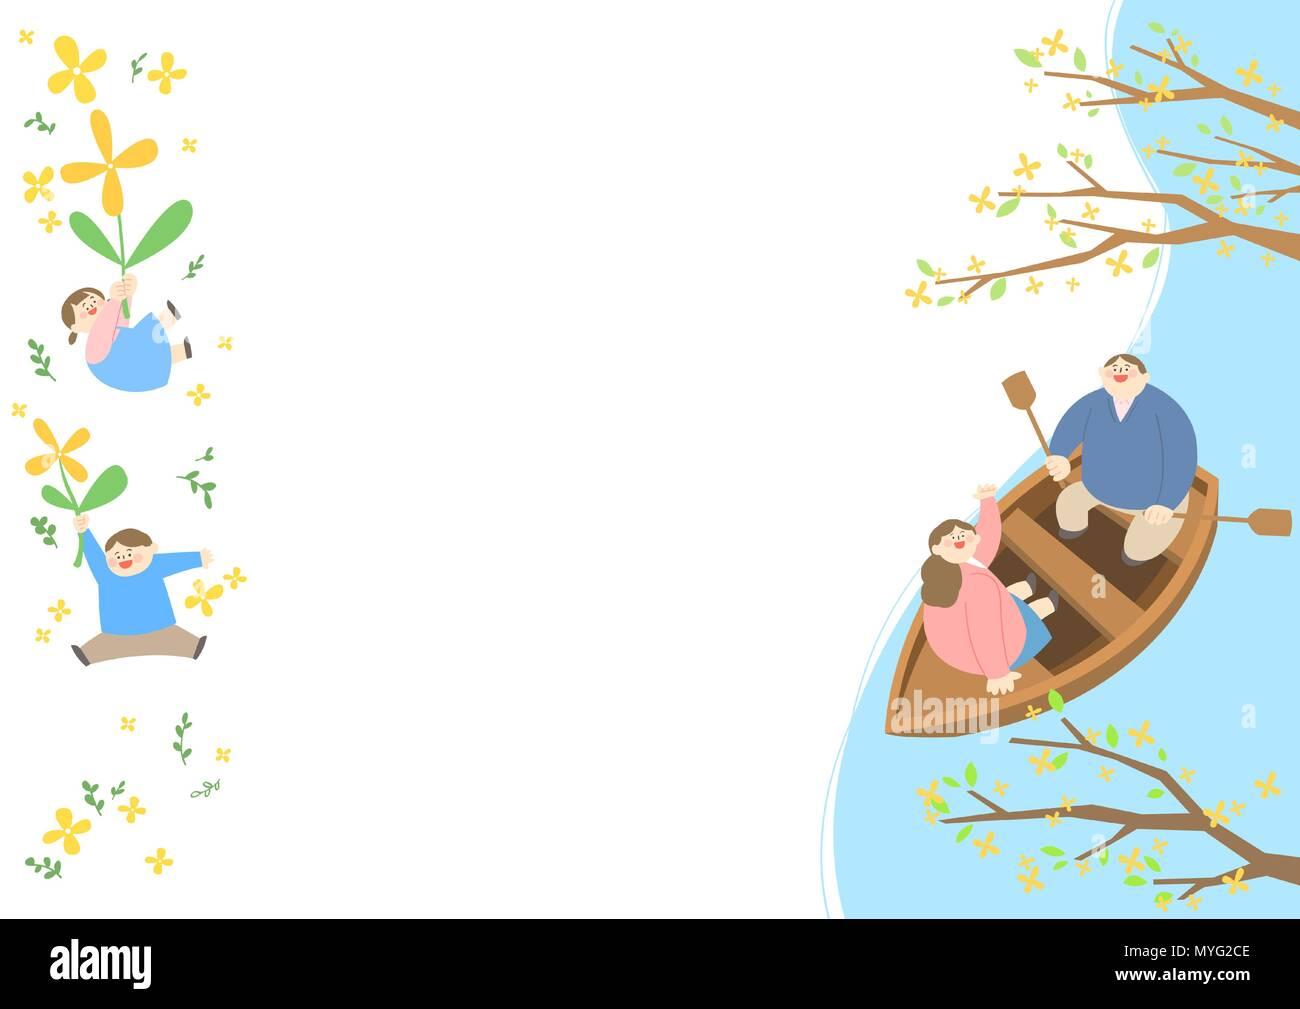 Vector - Welcome spring. Enjoy spring time illustration 007 - Stock Vector